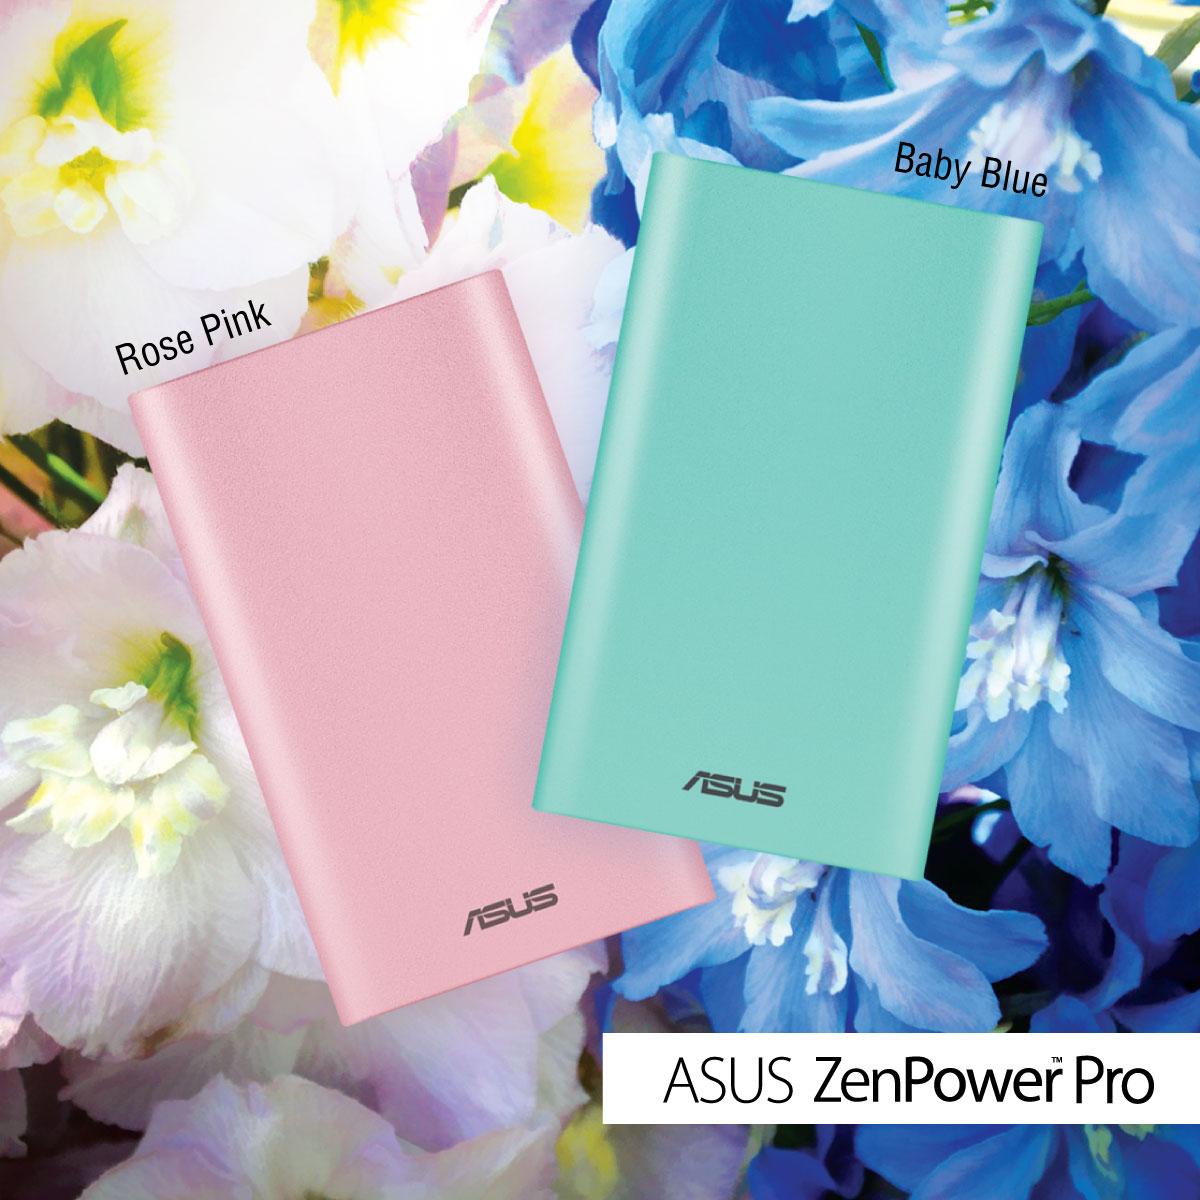 ASUS ZenPower Pro New Colors